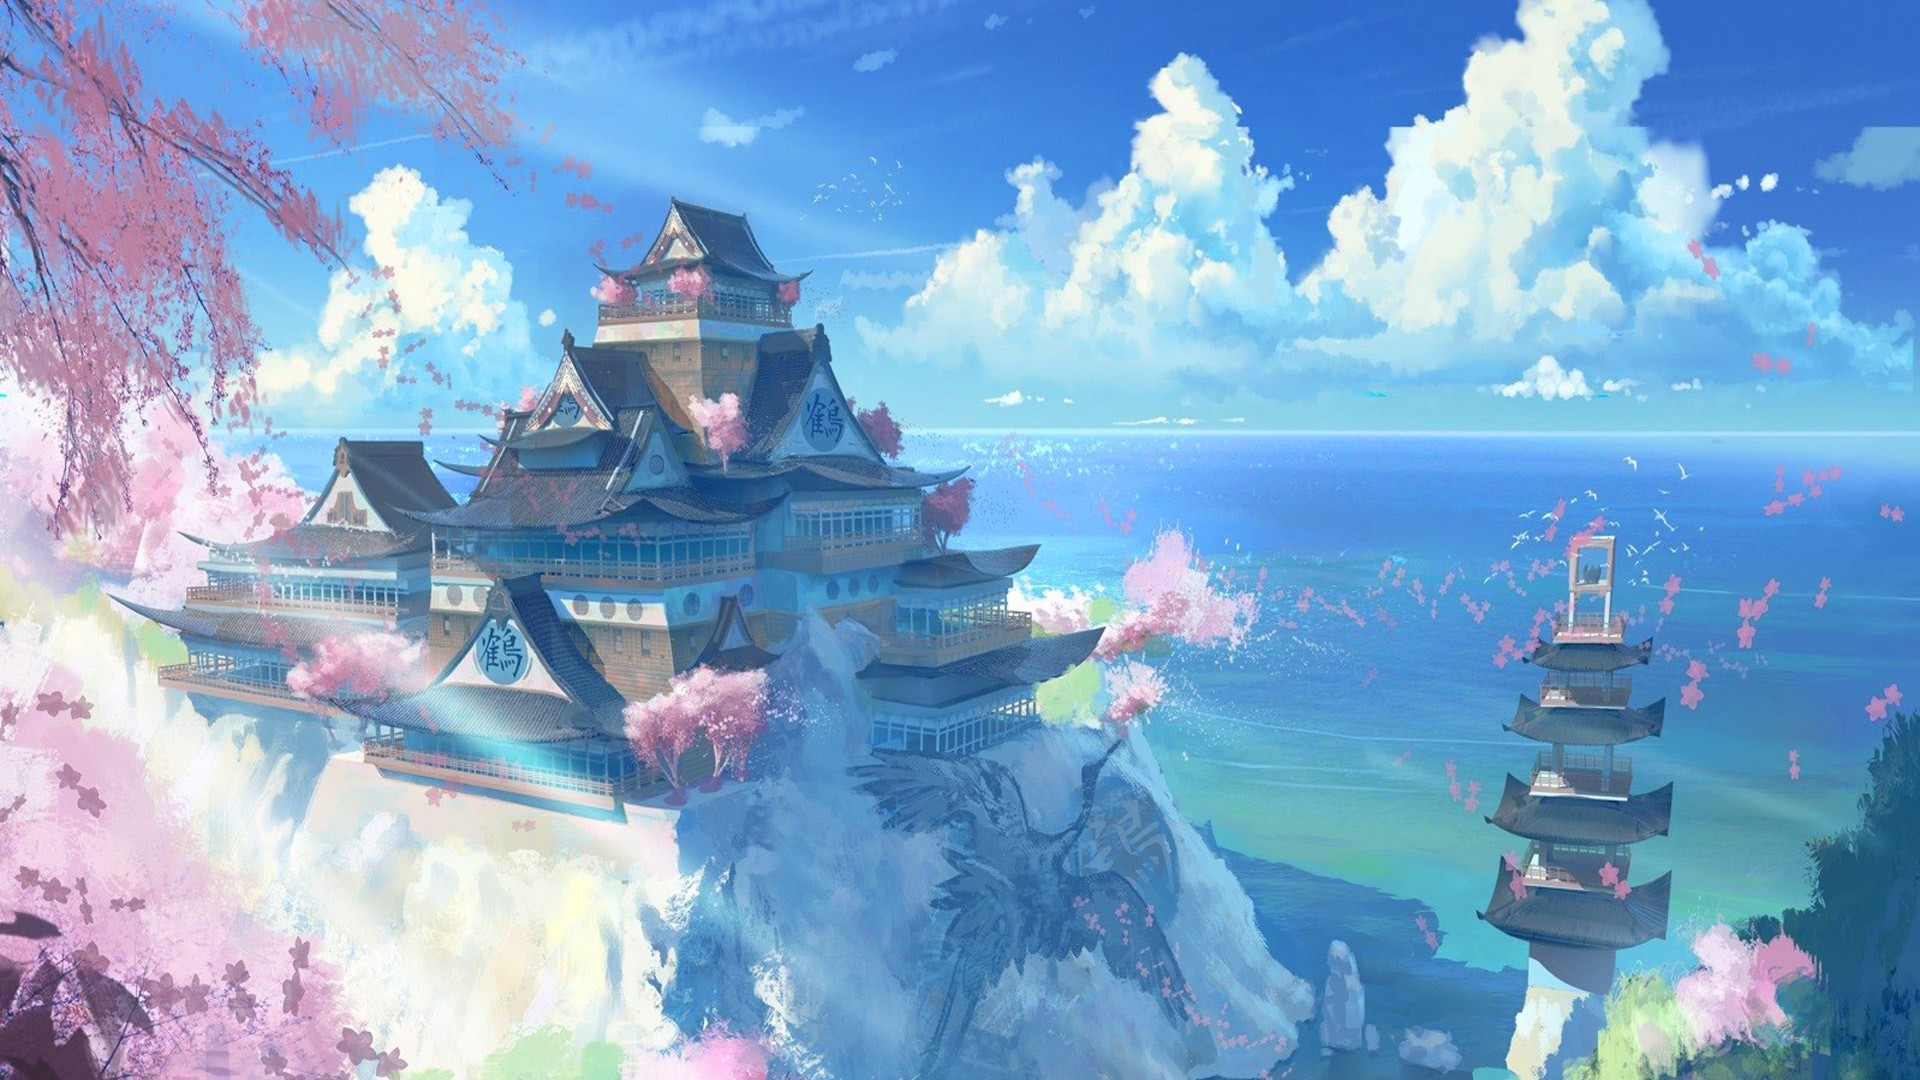 Res: 1920x1080, Awesome Anime Scenery Desktop Wallpaper Gallery - Free Japan Temple Scenery  Anime Manga puter desktop wallpapers